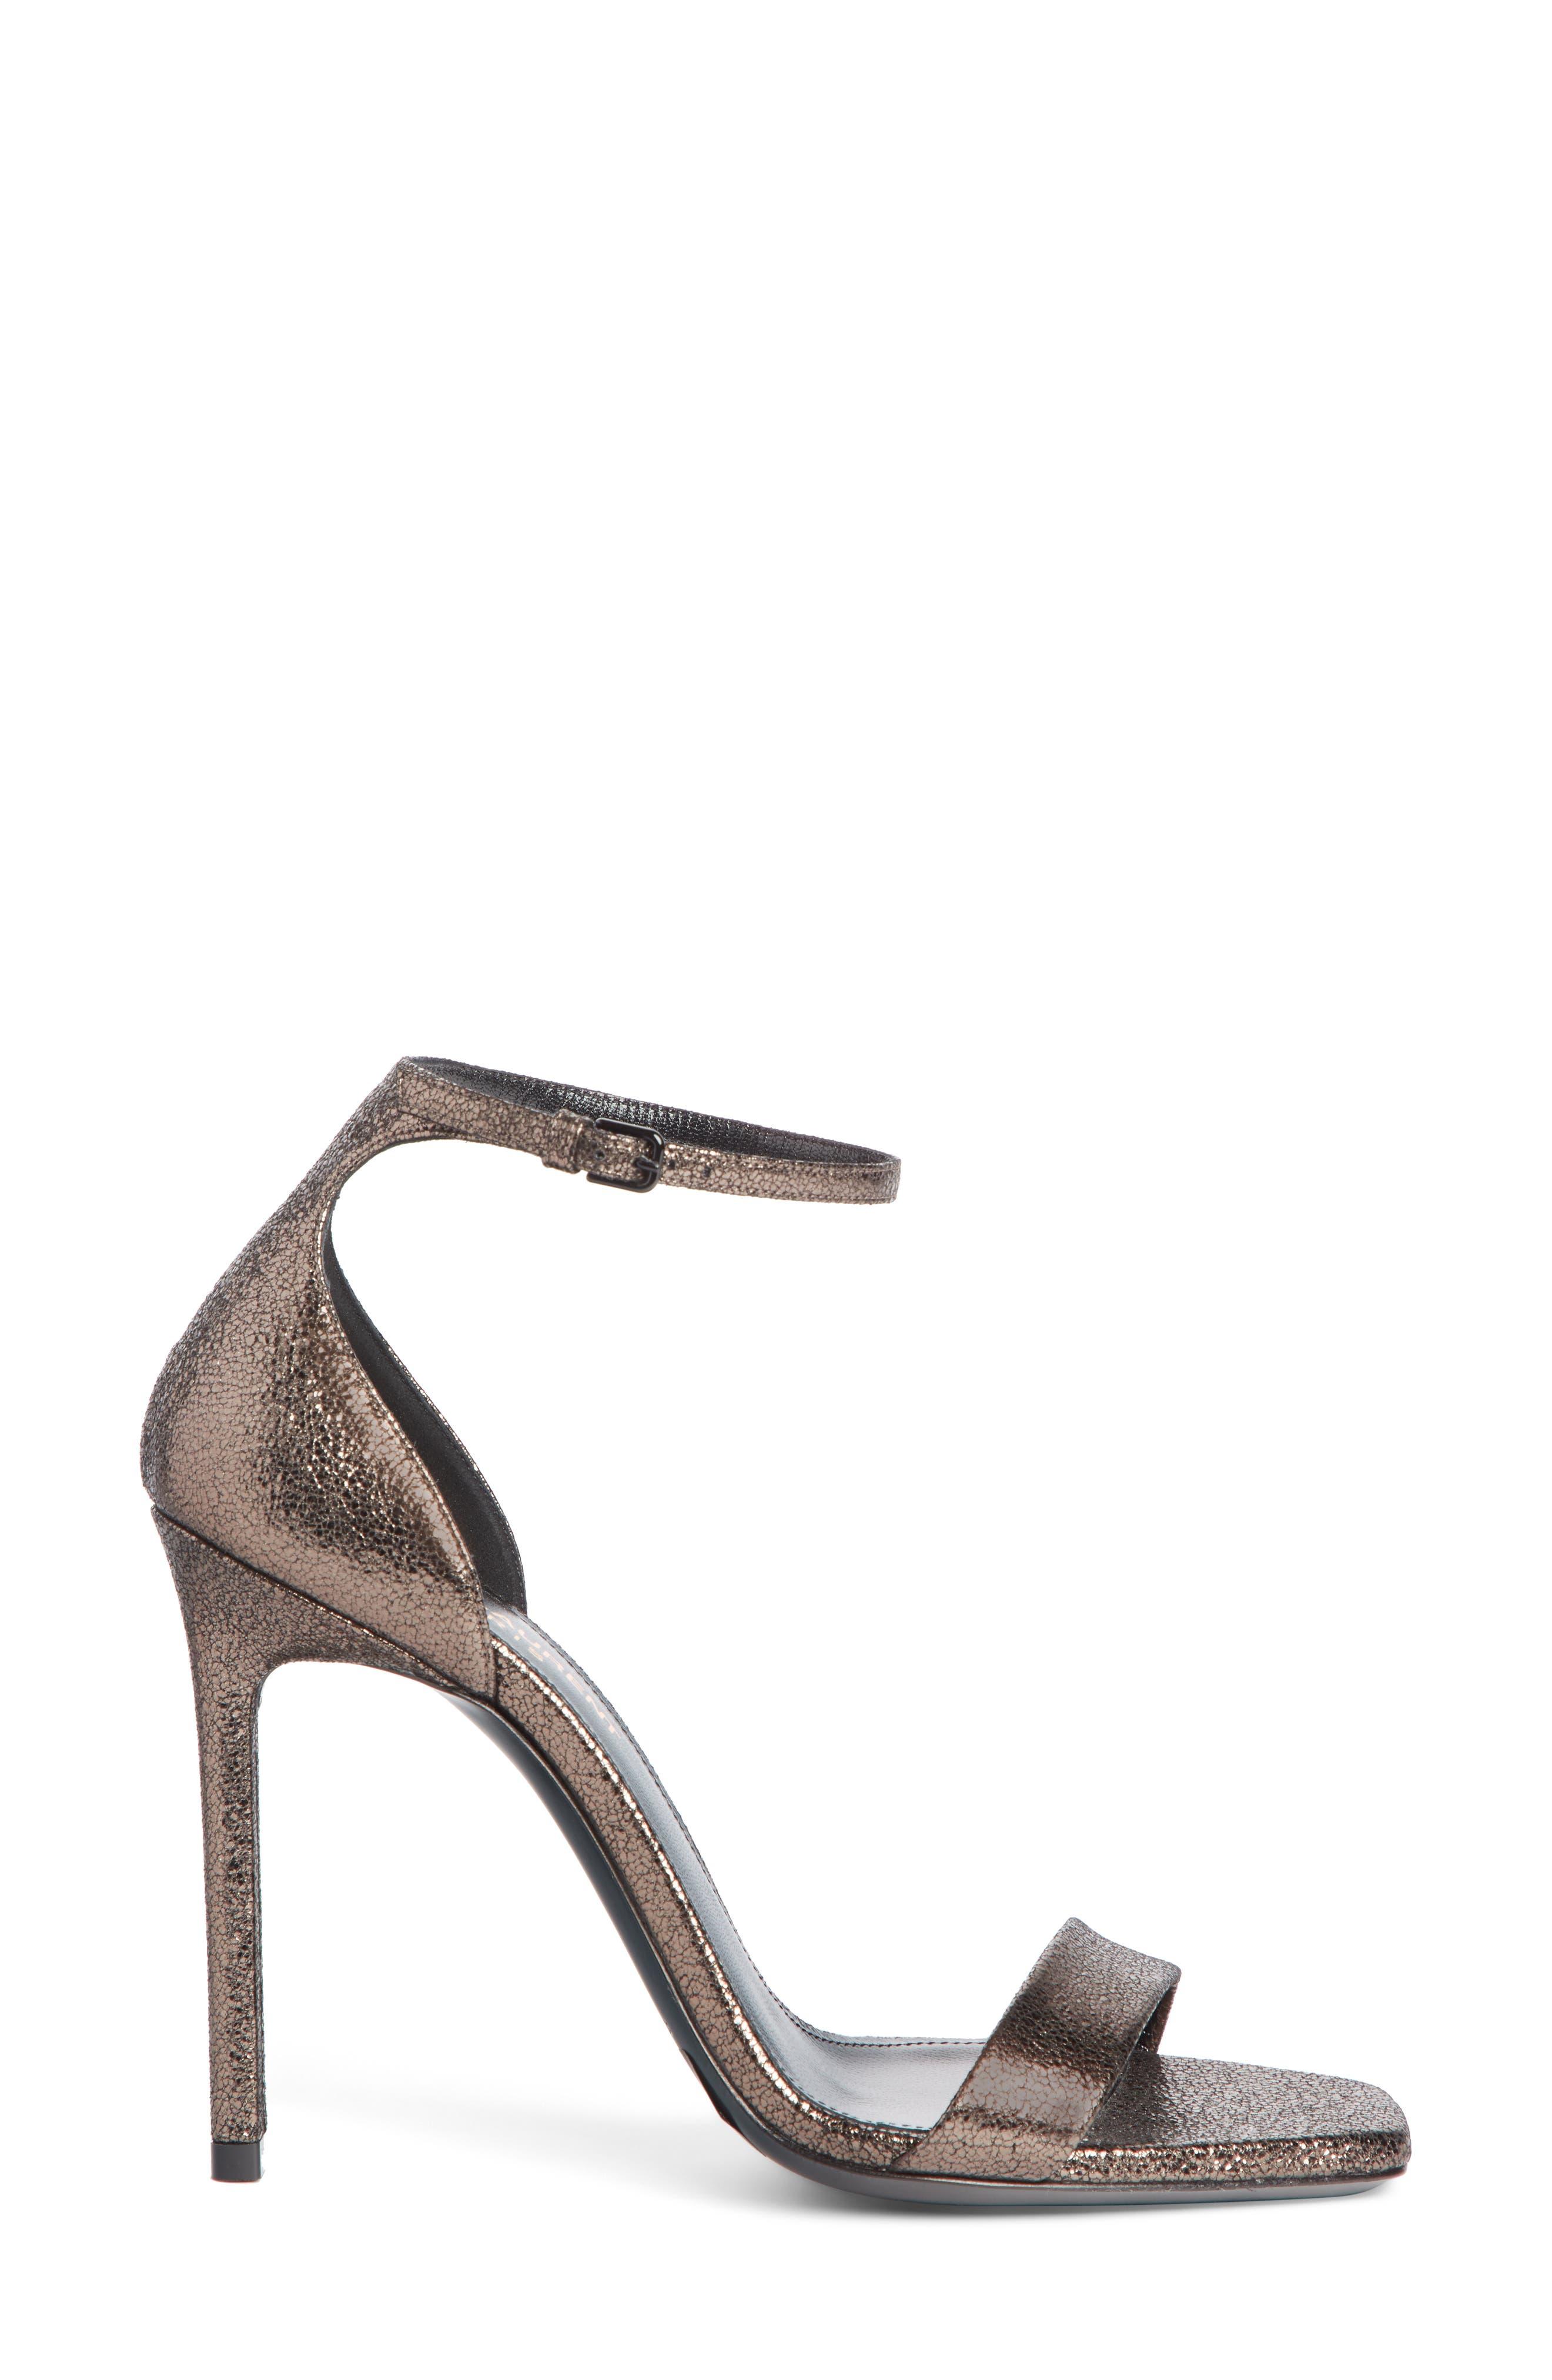 Amber Ankle Strap Sandal,                             Alternate thumbnail 3, color,                             BLACK/ METALLIC